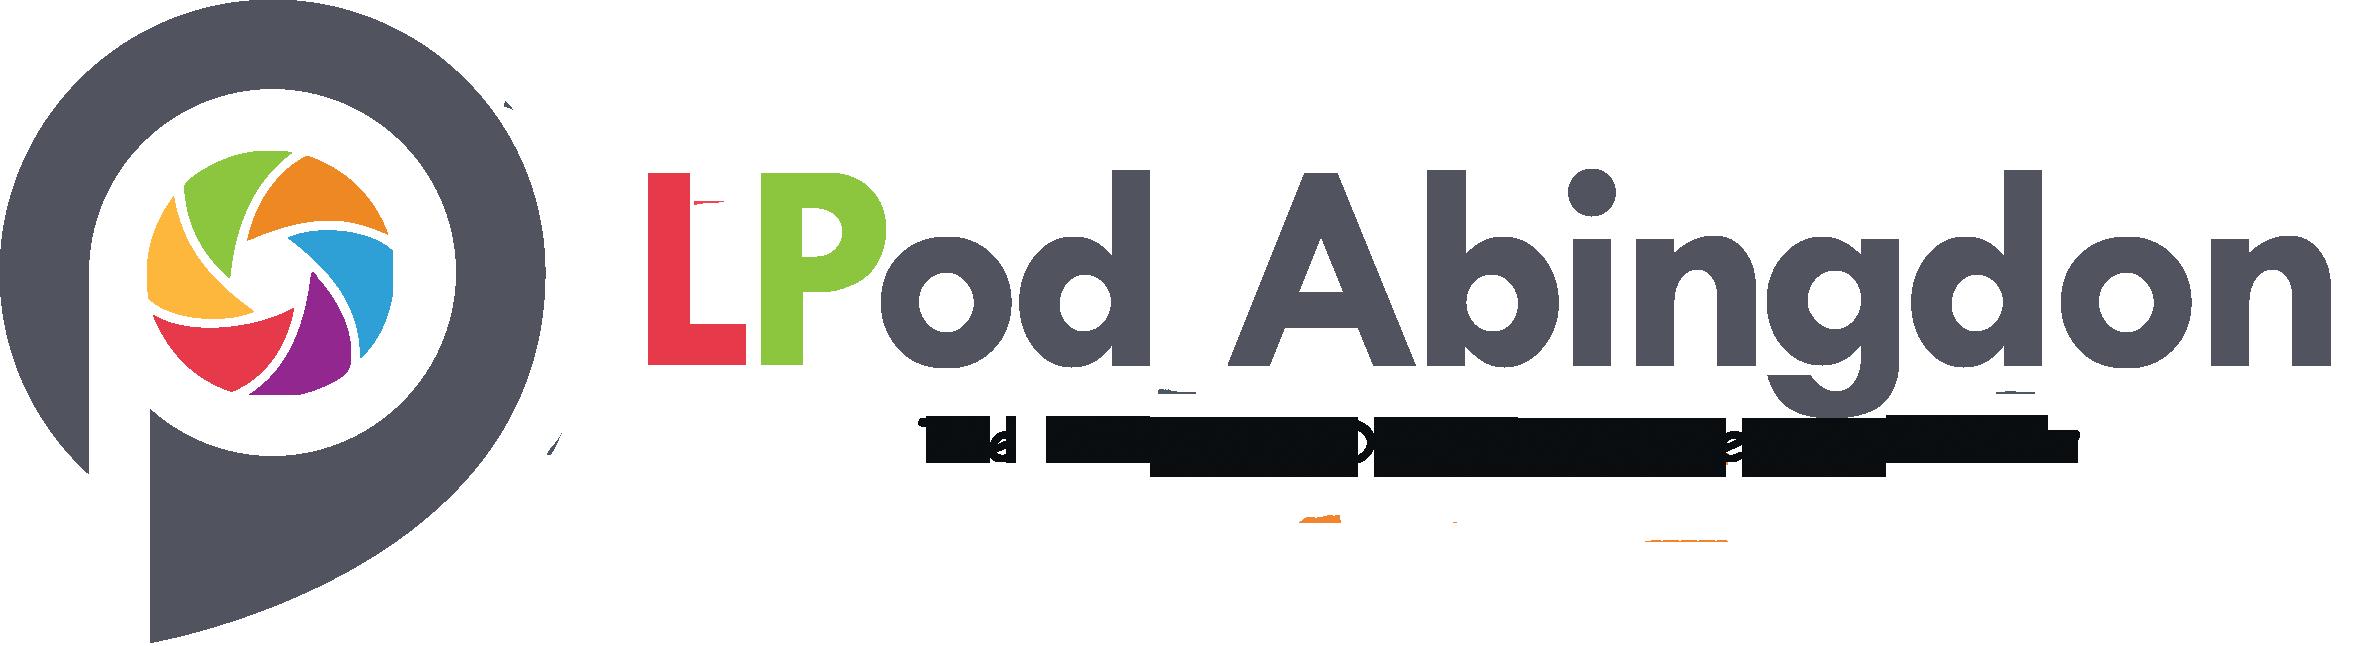 intensive driving courses abingdon, intensive driving lessons abingdon, intensive driving school abingdon